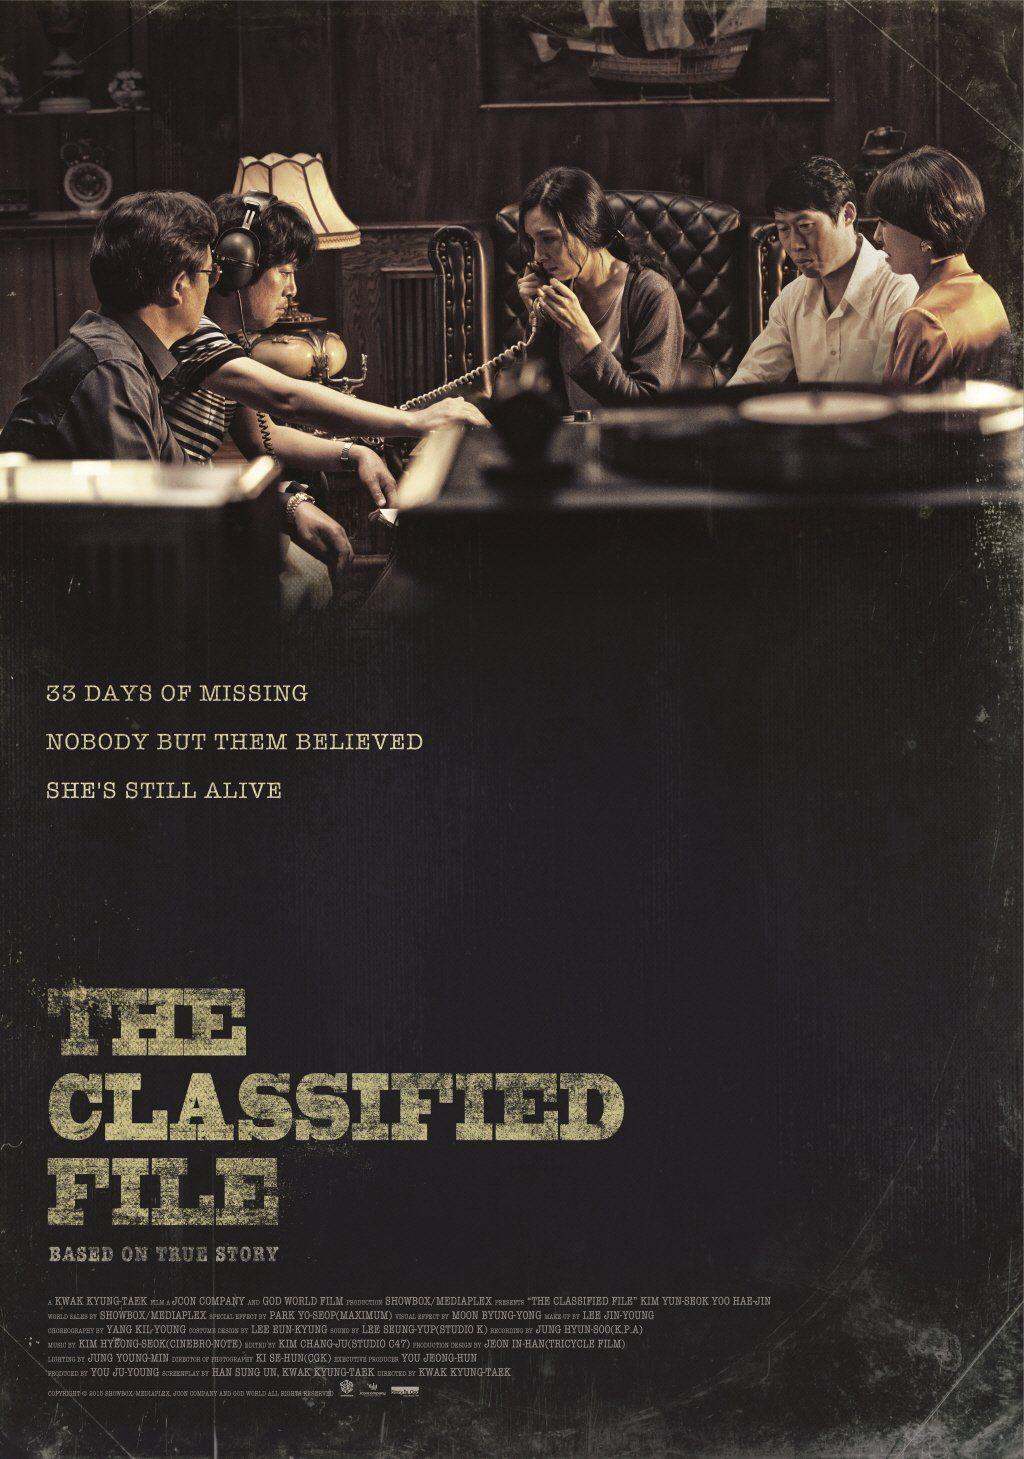 The Classified File 극비수사 Korean Movie Picture Film Korean Movies Online Full Films